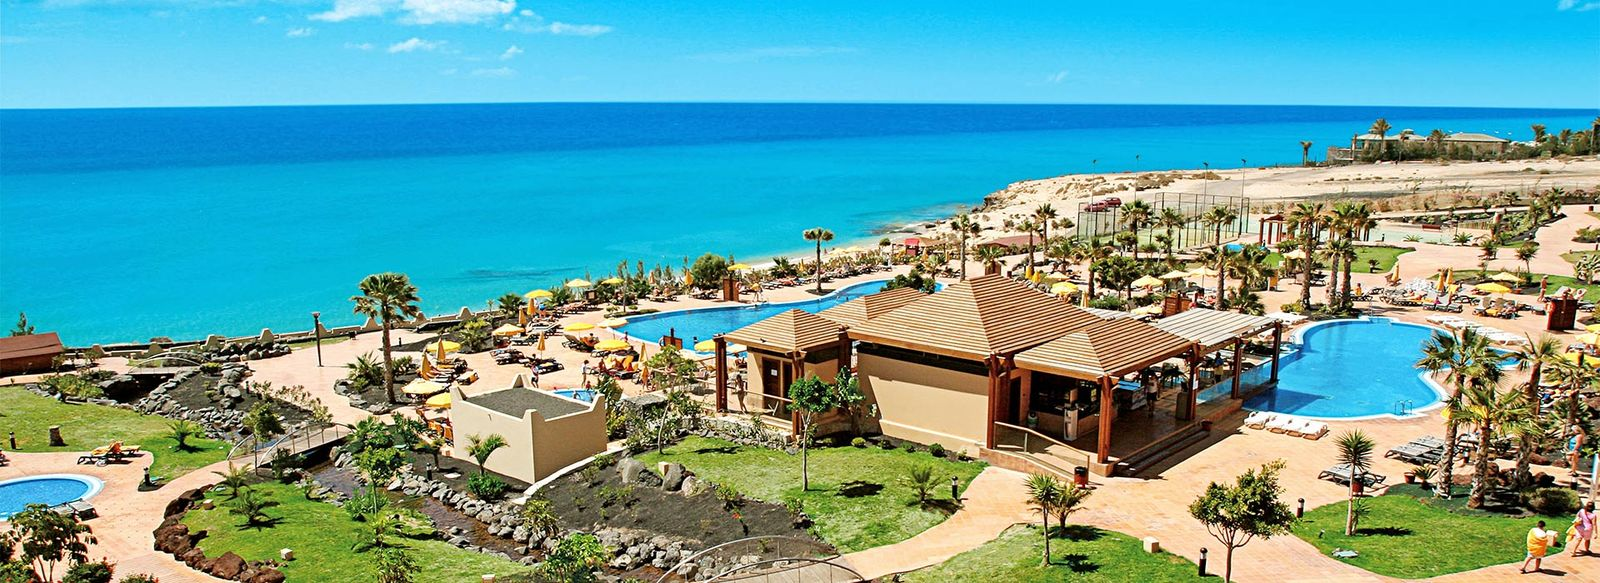 Miglior prezzo Veraclub Tindaya - Fuerteventura - Costa Calma ...